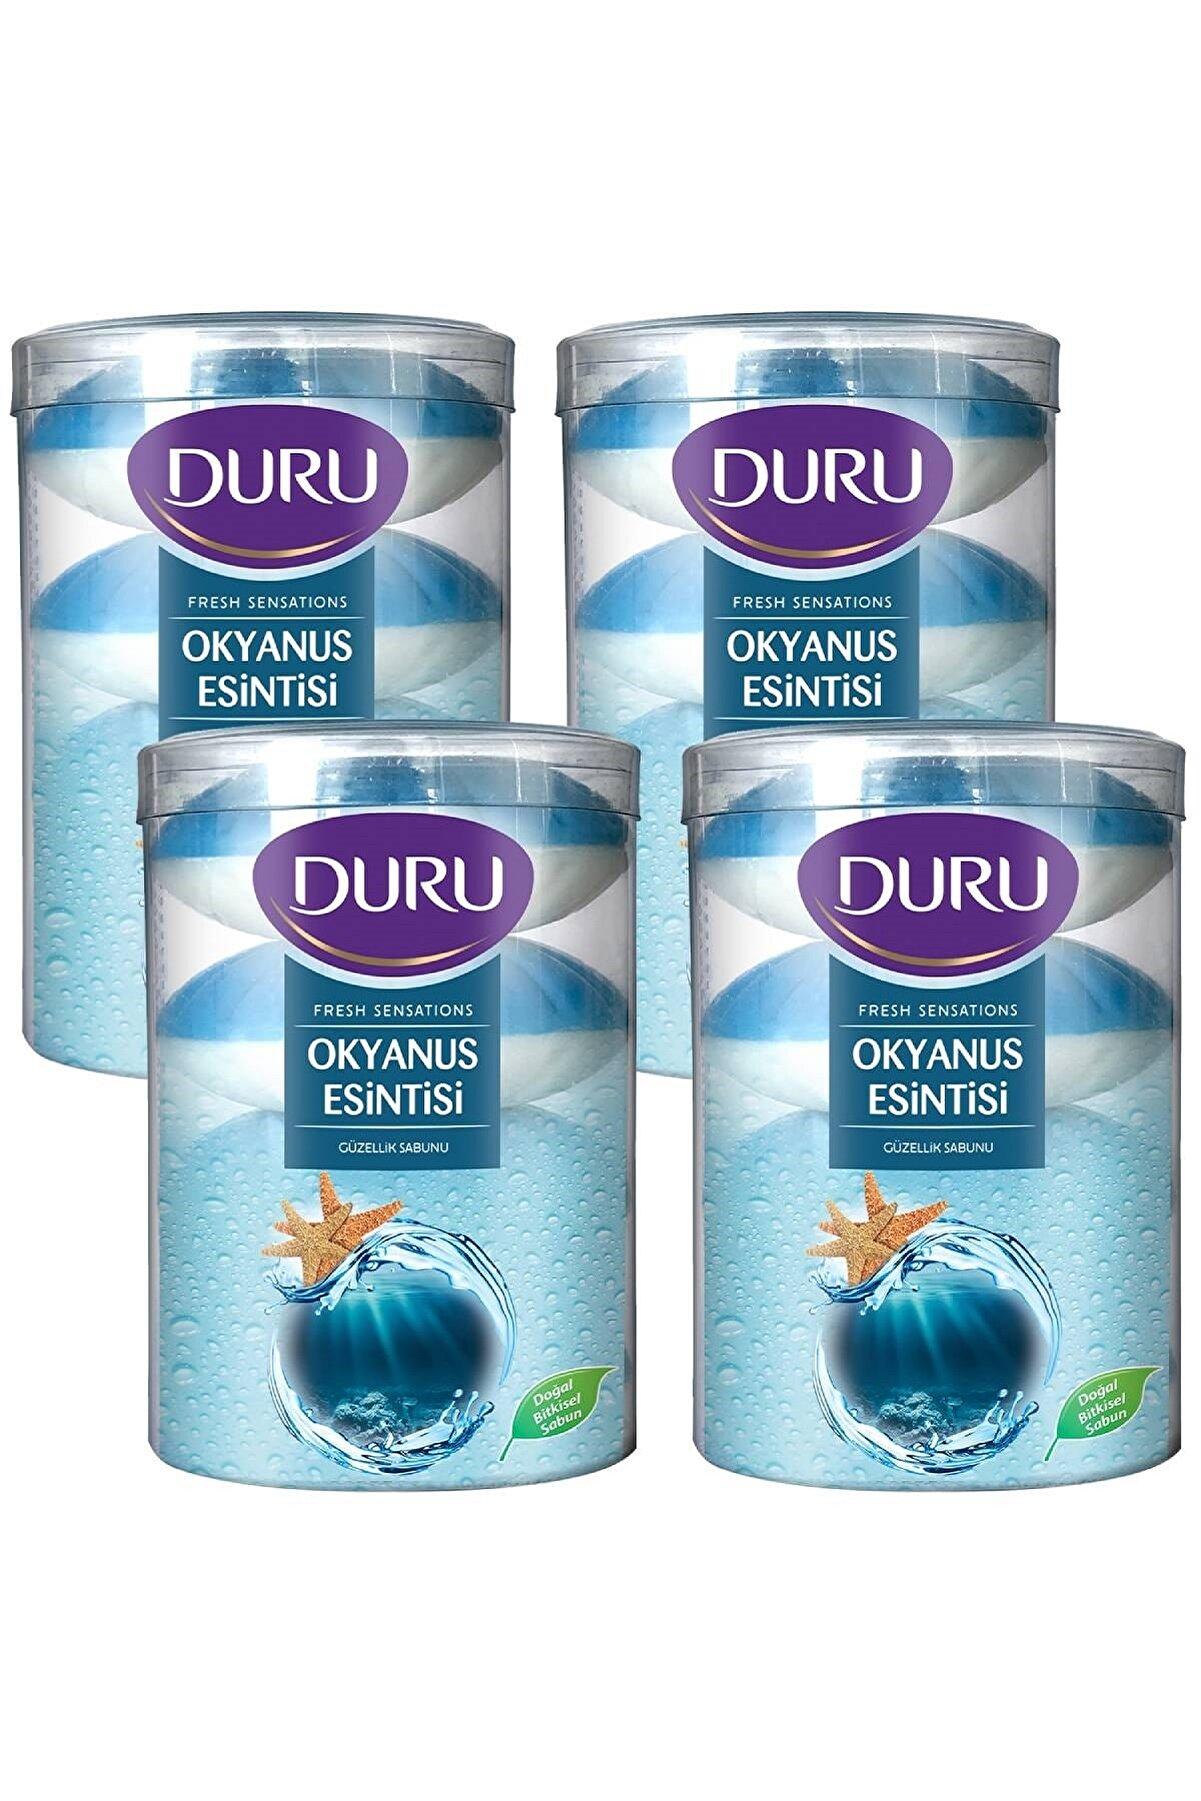 Duru Fresh Sensations Okyanus Esintisi 16 Adet Güzellik Sabunu 4x440 gr